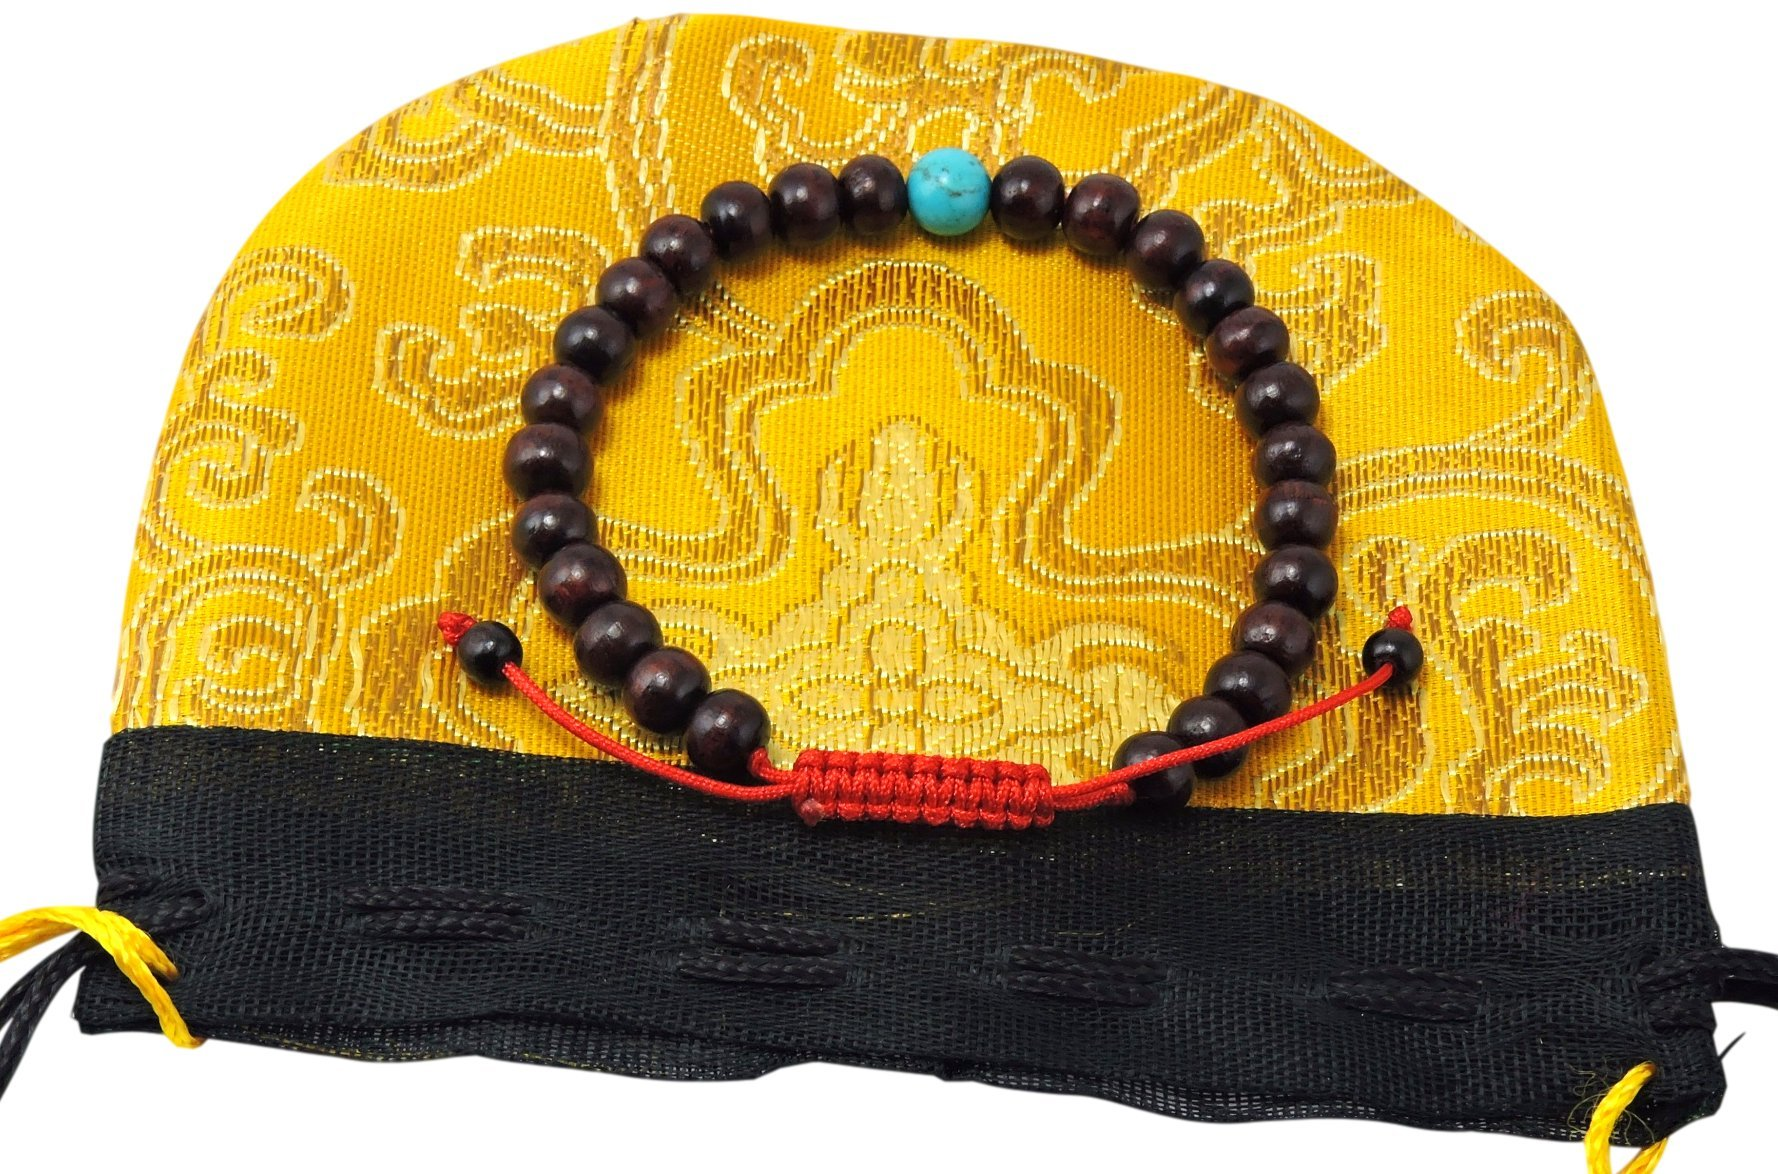 Rosewood Turquoise Wrist Mala/ Bracelet for Meditation RM-29